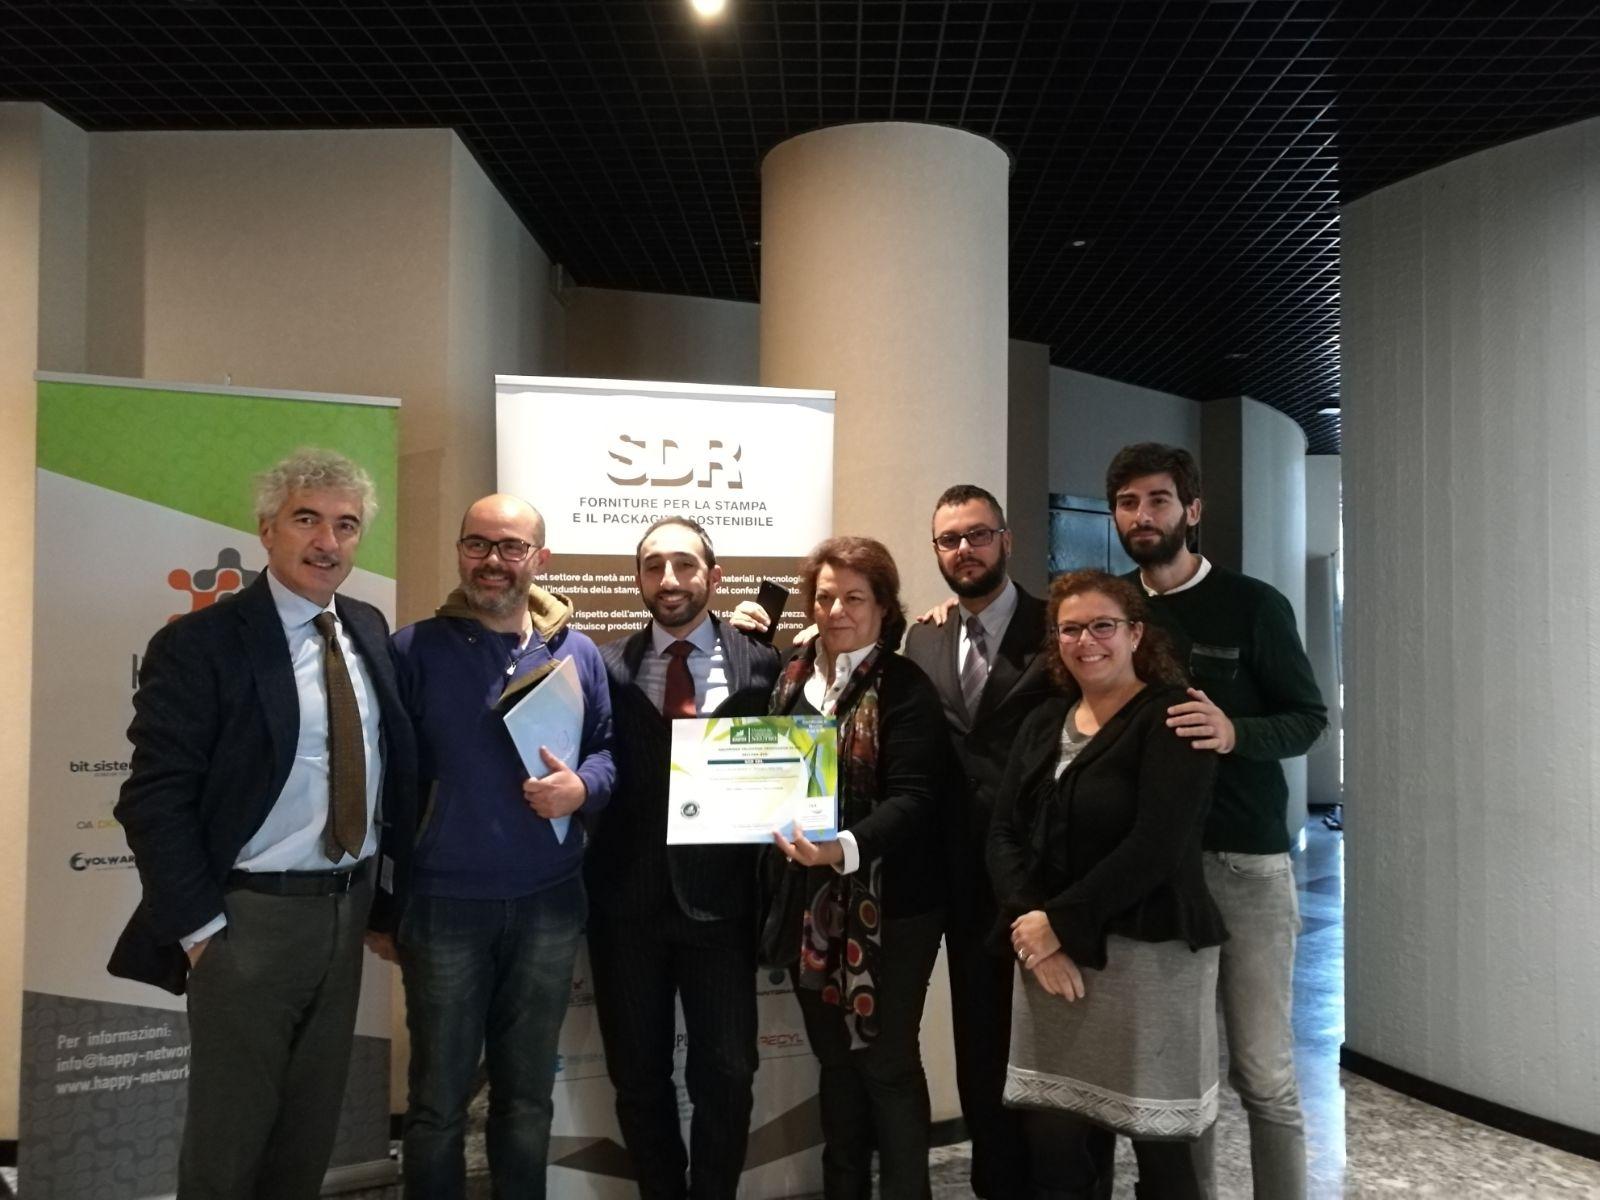 certificazione carbonio neutralità - team SDR srl